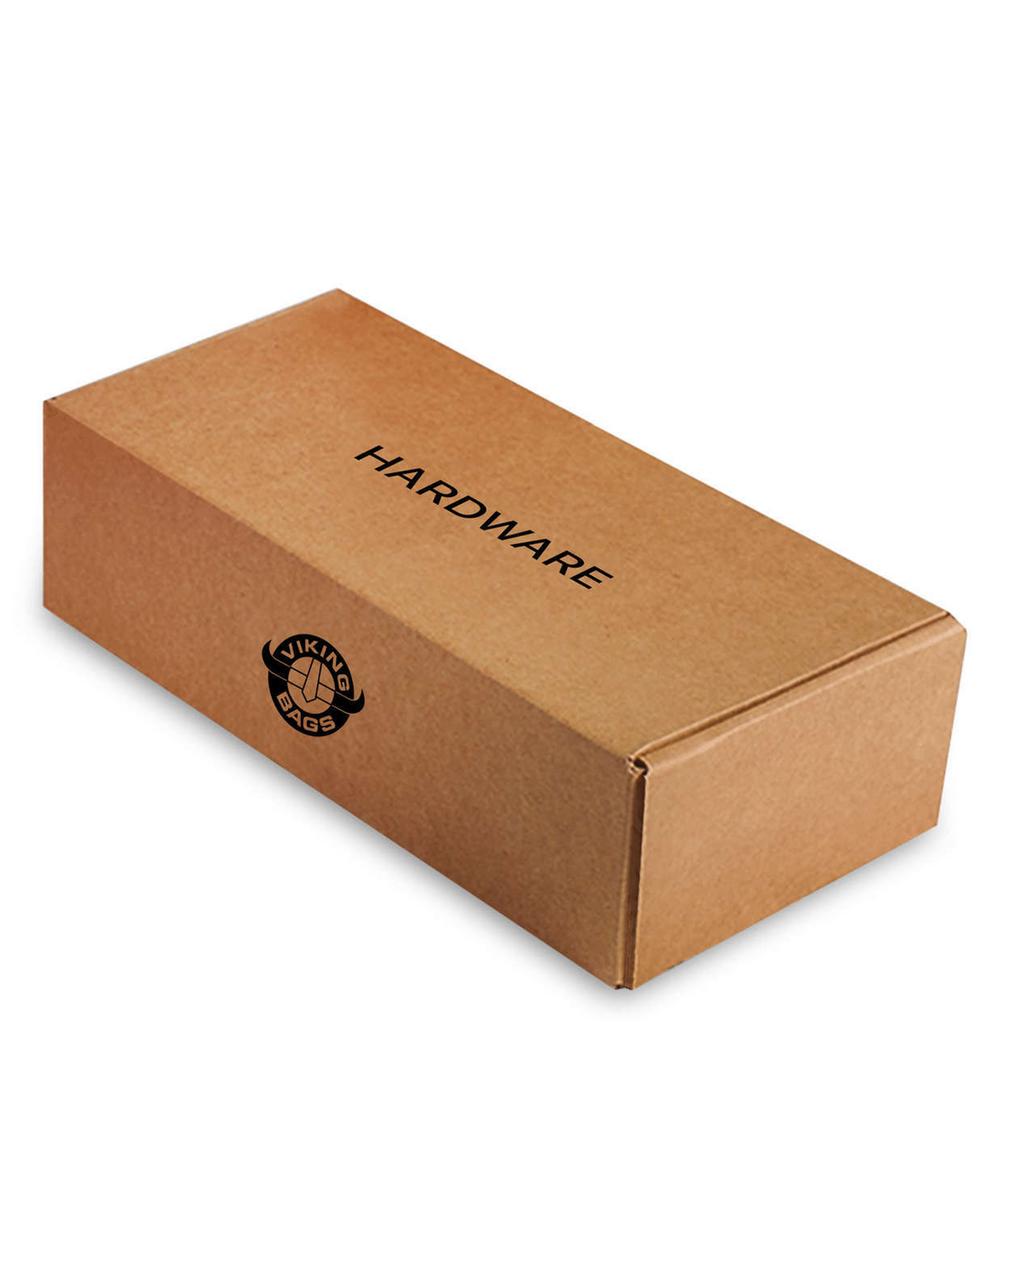 Honda 1100 Shadow Sabre Lamellar Extra Large Shock Cutout Leather Covered Saddlebag box